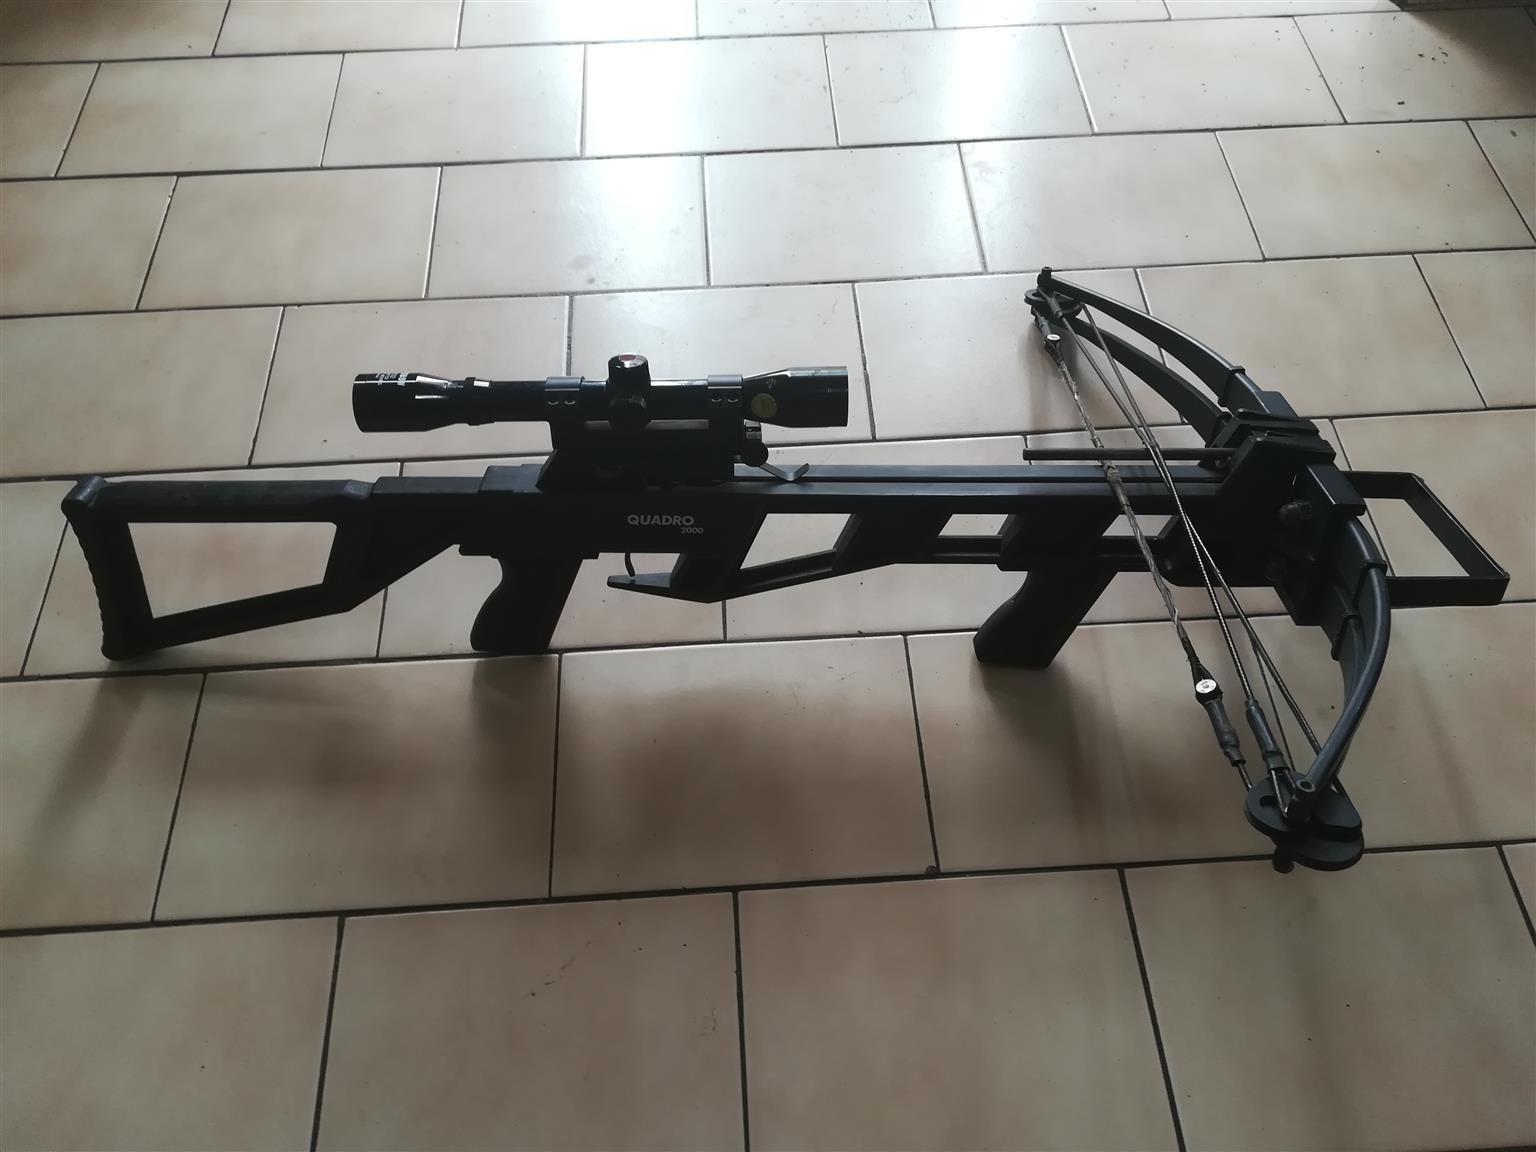 CrissbowCrisbow MK III Quadro 2000